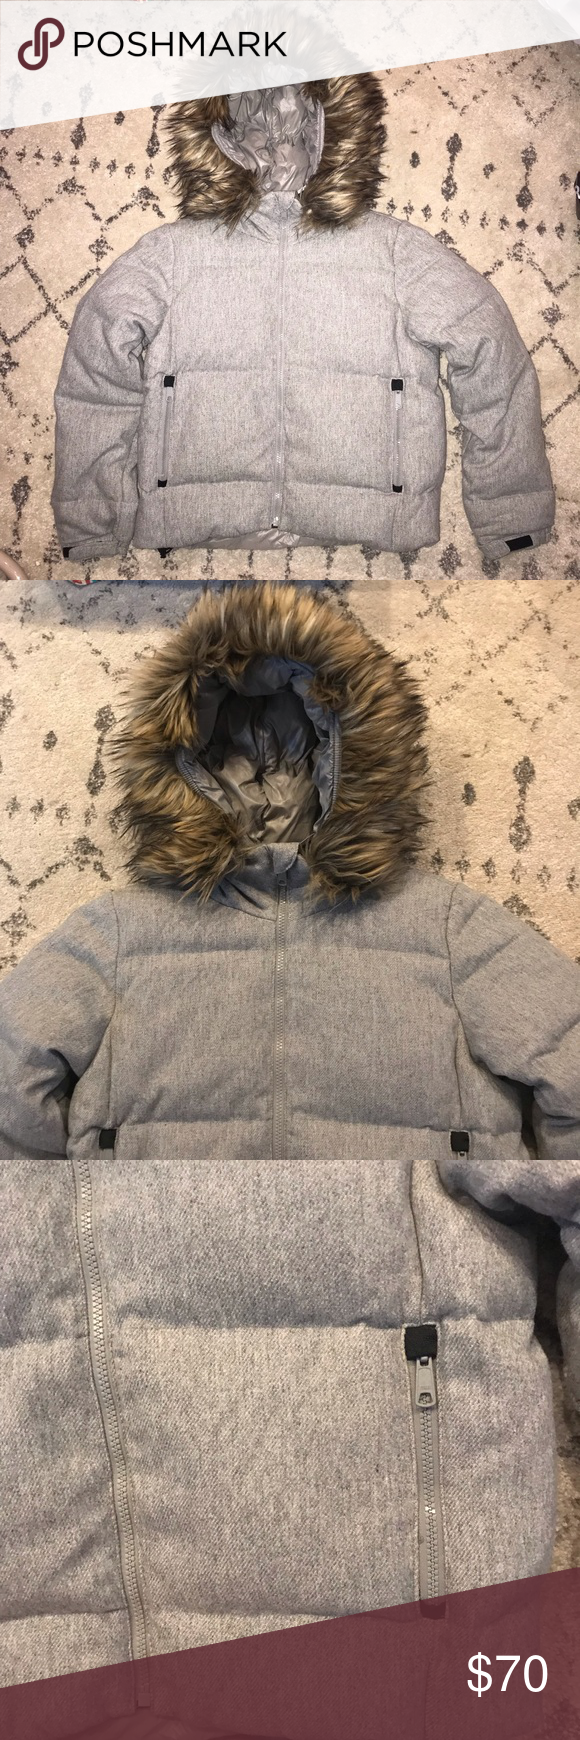 Gap Winter Warmth Outdoor Edition Puffer Jacket Faux Fur Hood Winter Warmth Gap Jacket [ 1740 x 580 Pixel ]